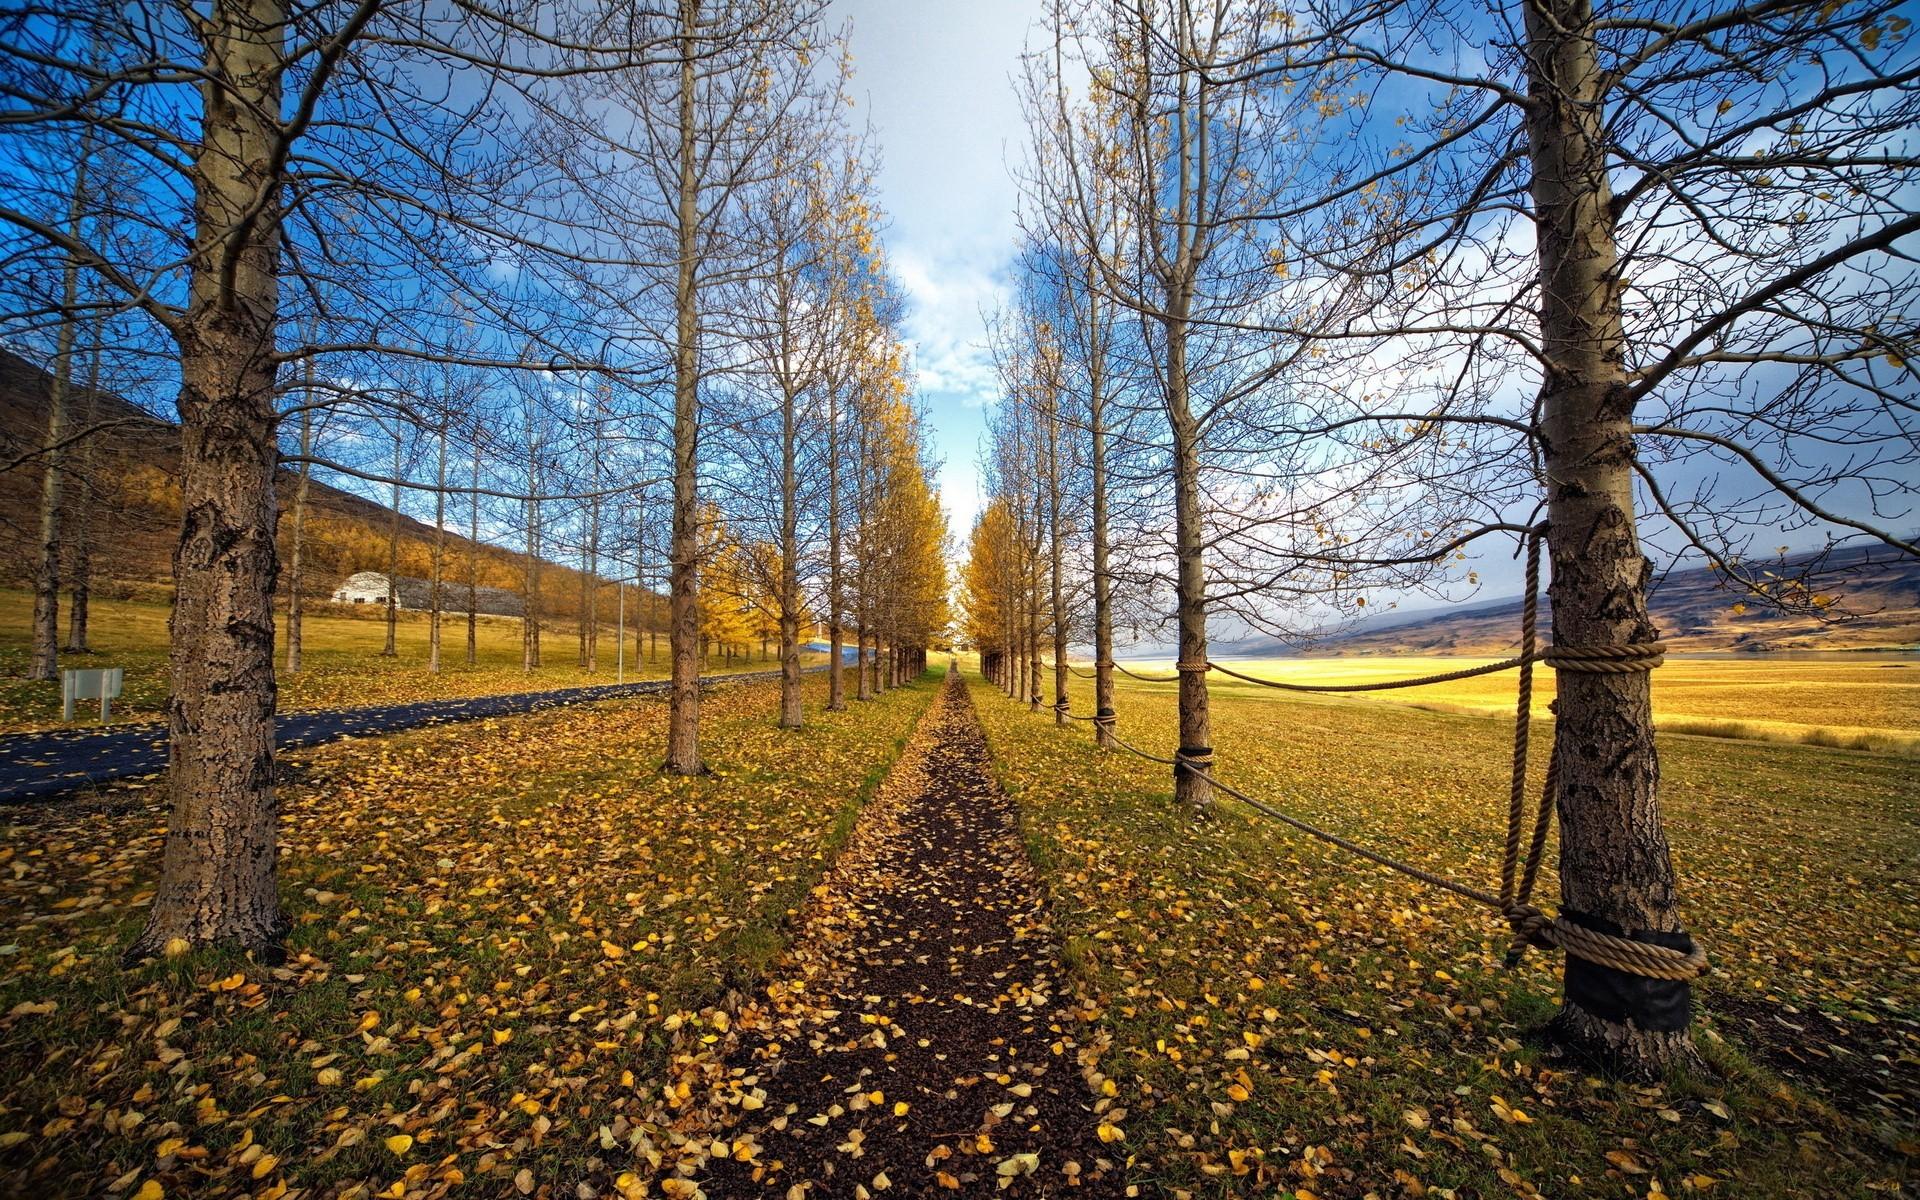 Blue h - Landscape Wallpapers Free Download